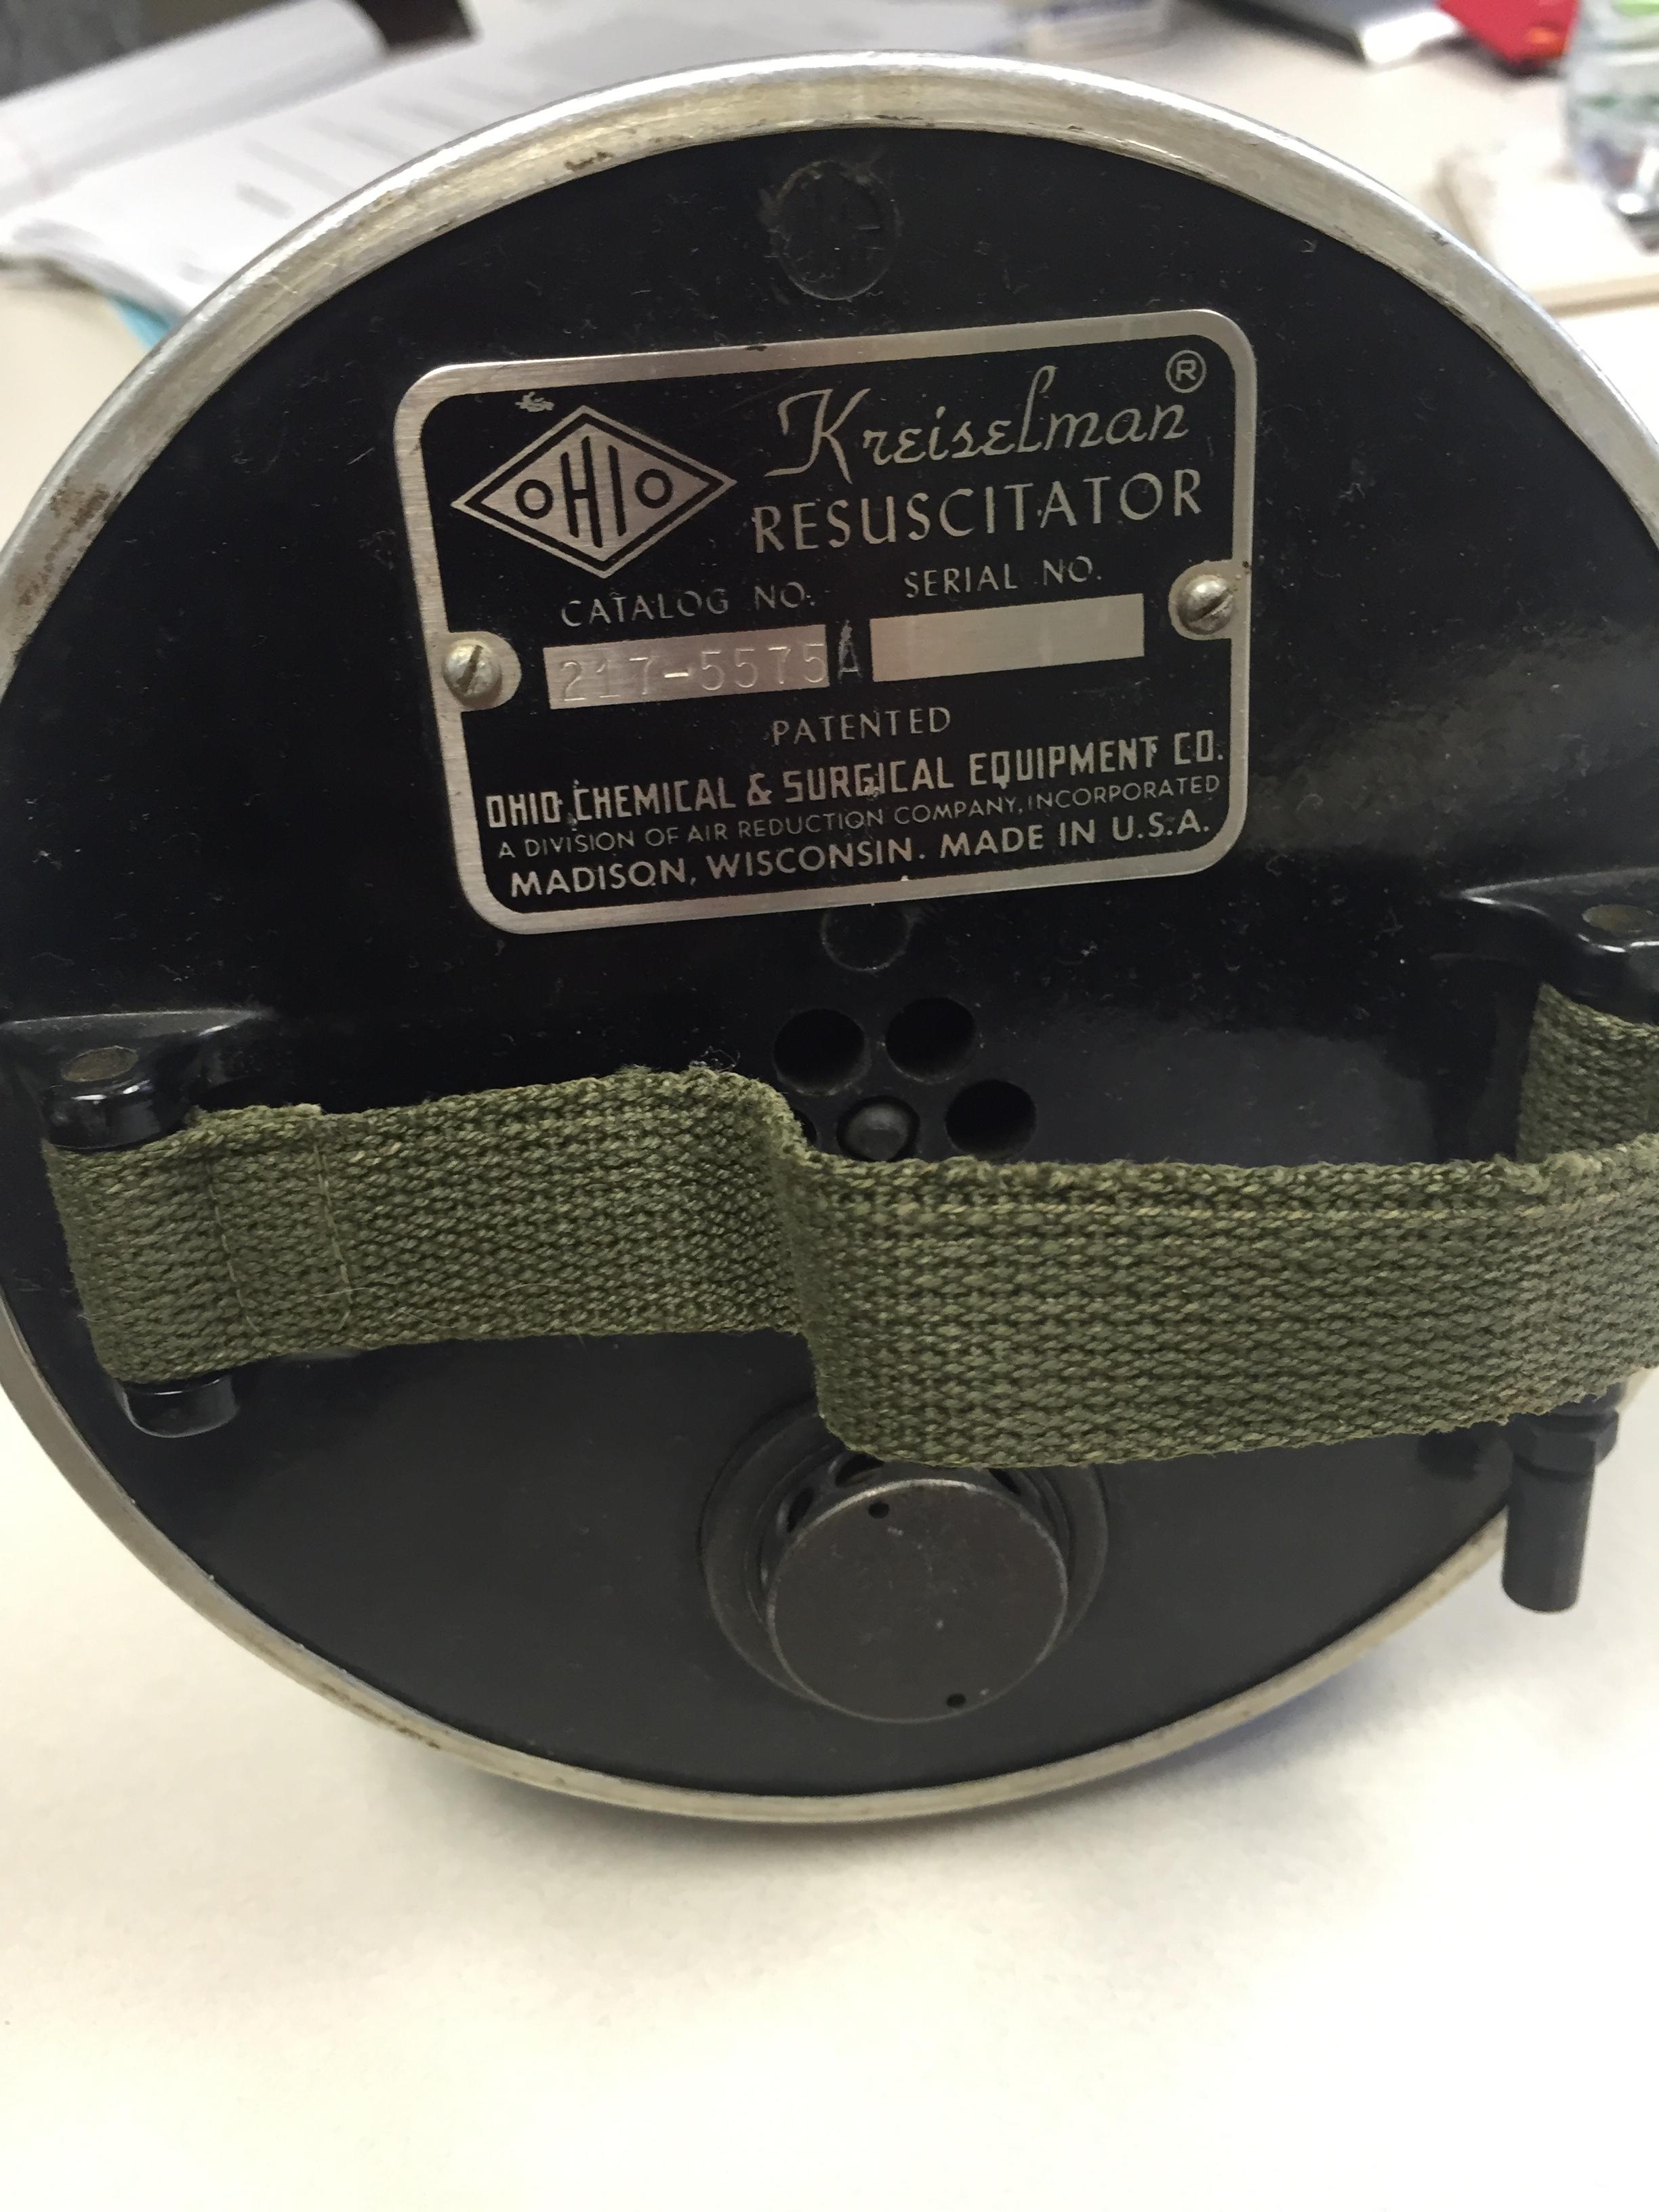 Kresielman Resuscitator